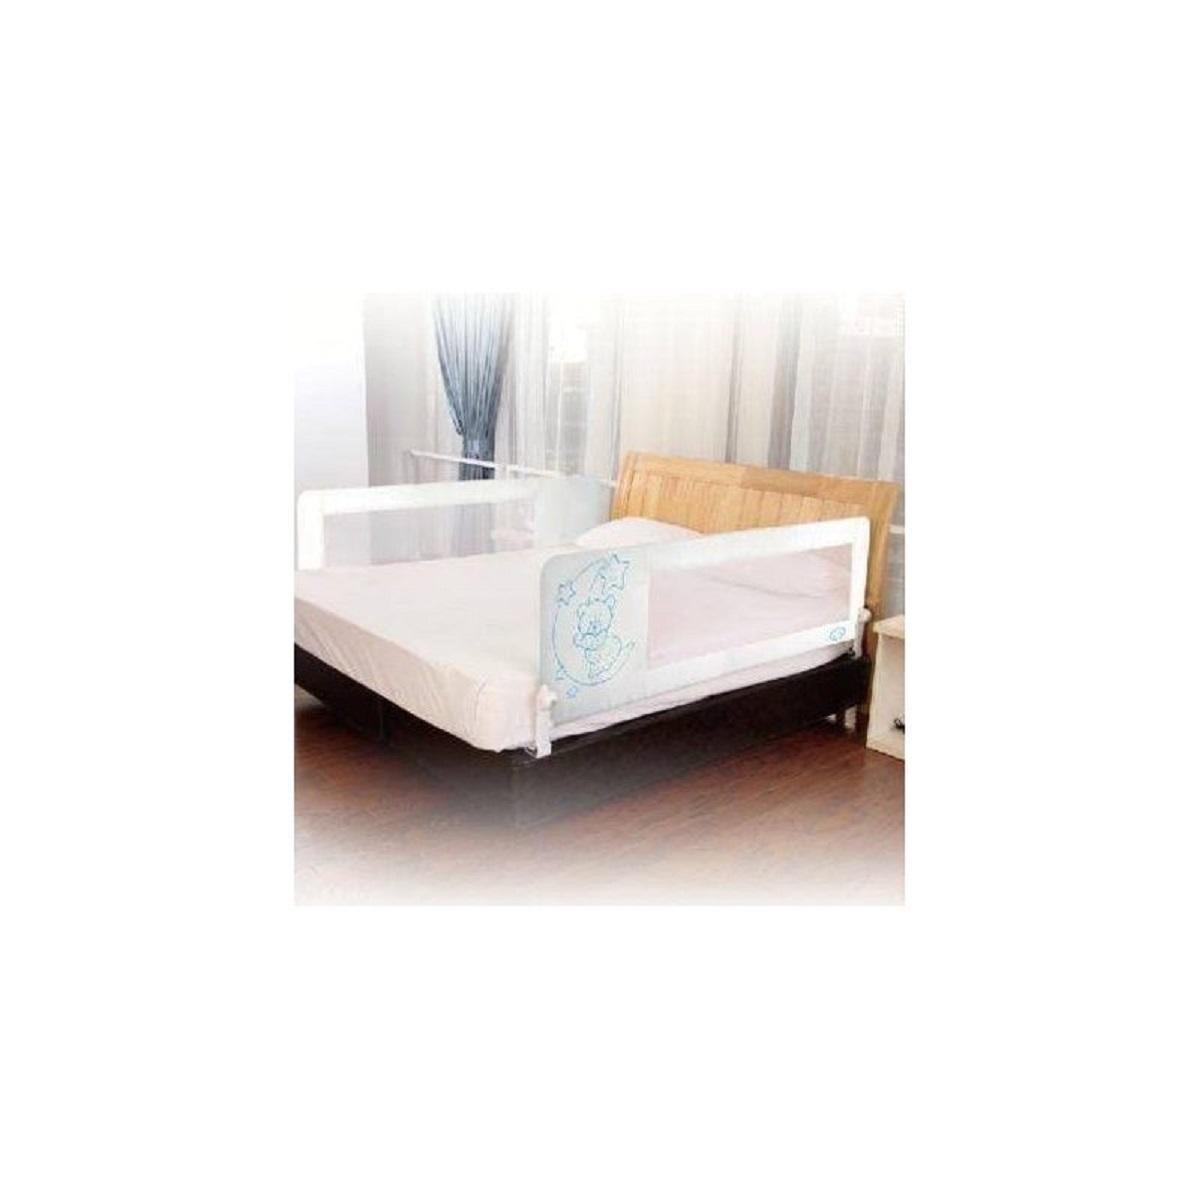 Baranda de cama Osito Celeste 1,50